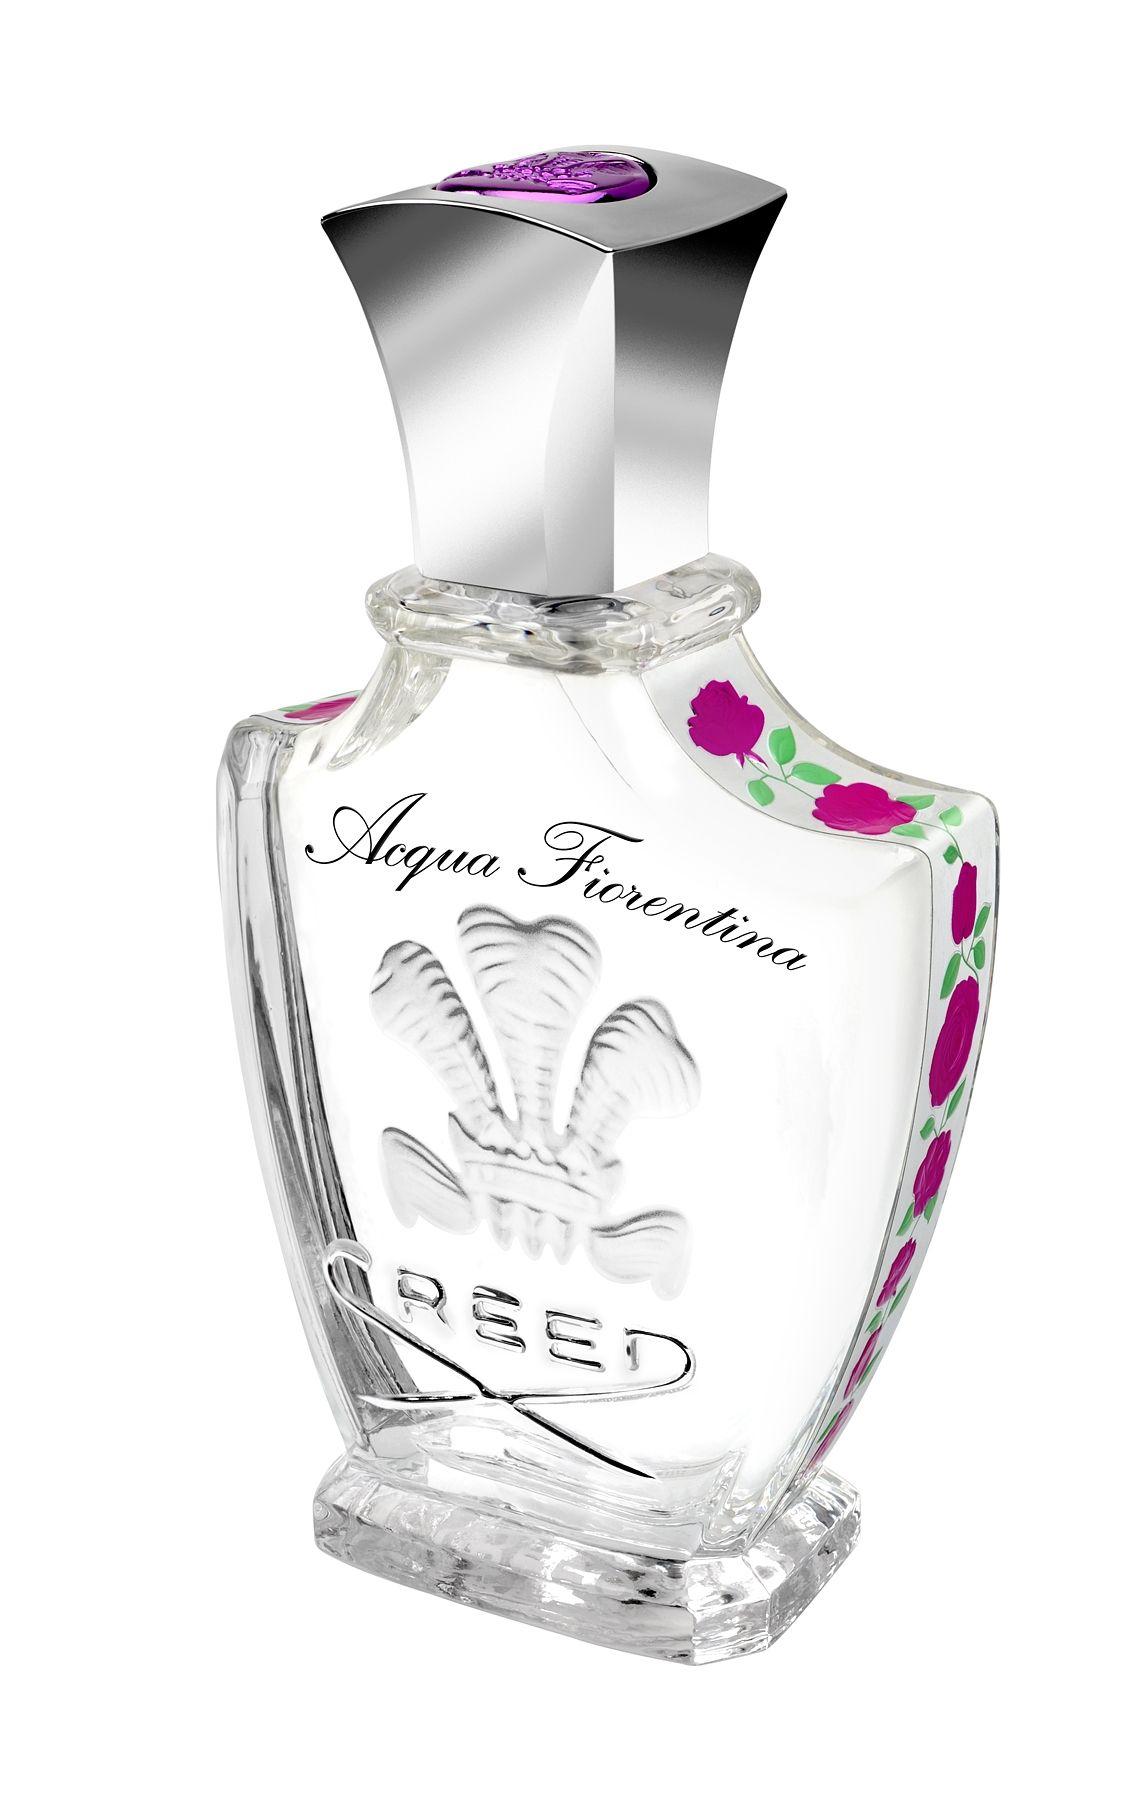 acqua fiorentina | CREED Boutique Blog | Perfume, Perfume